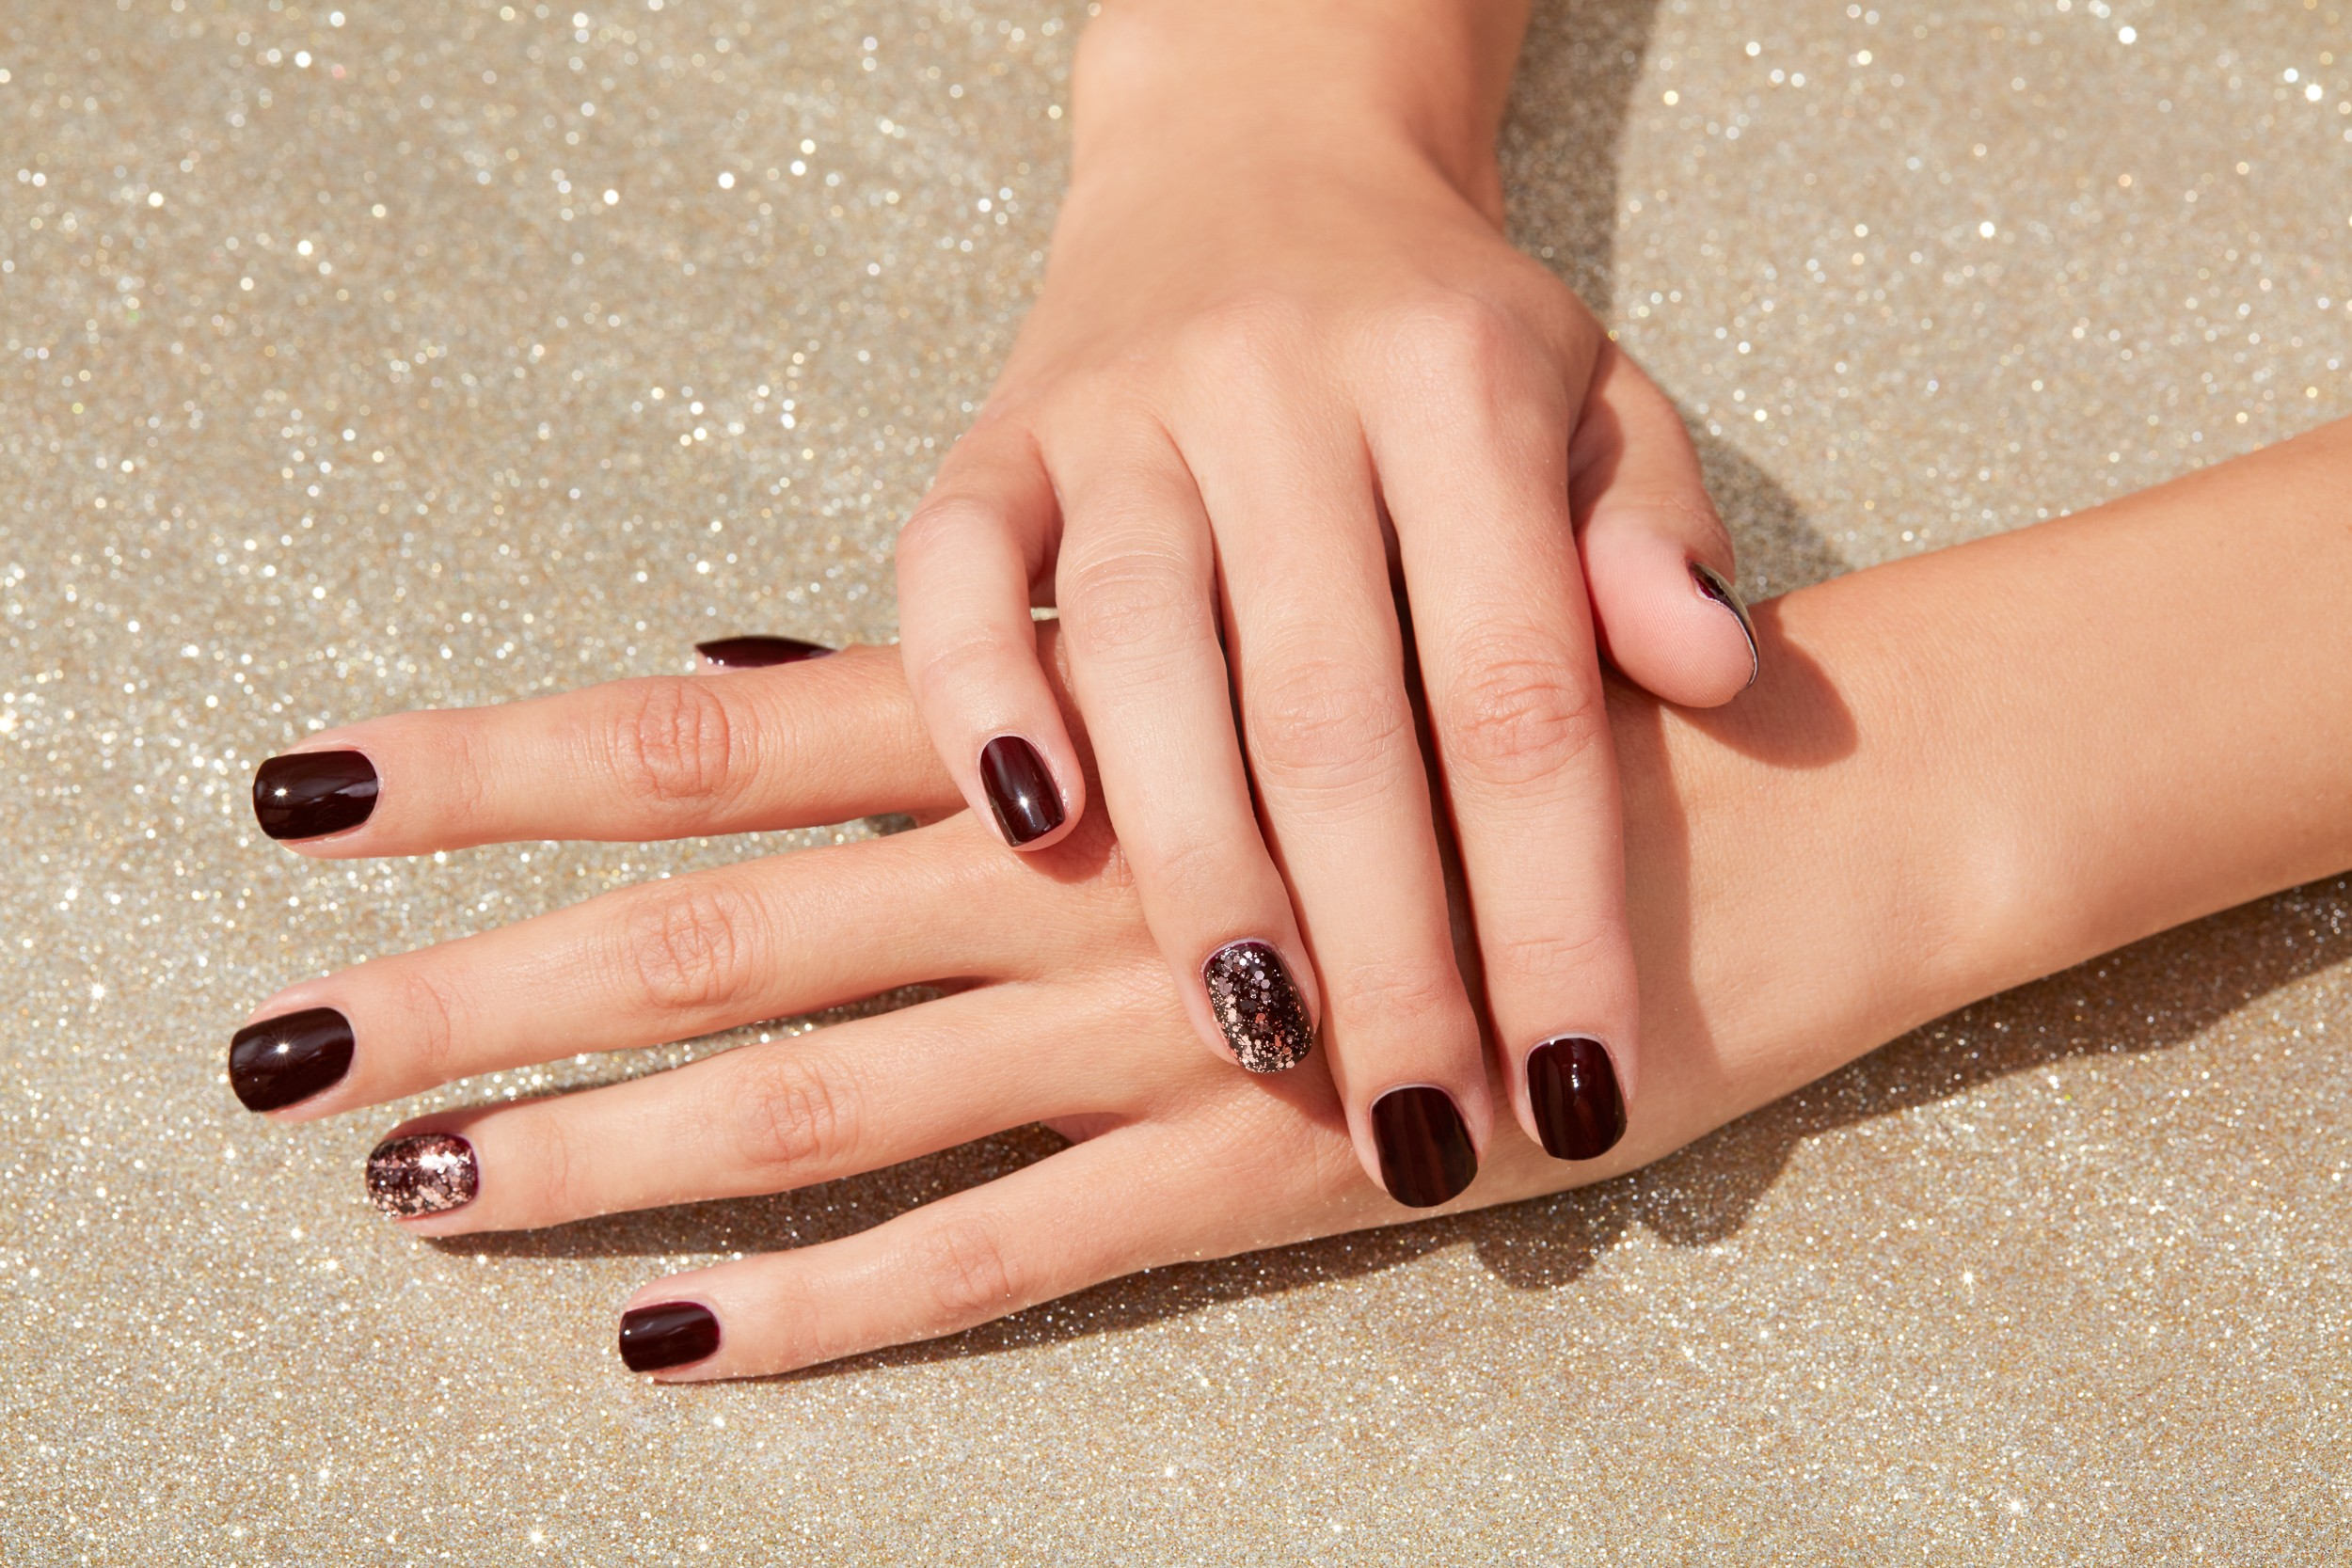 Nailcare-application-naildesign-hand-glitter-nailpolish-v2-unlimited-Web-Rendition